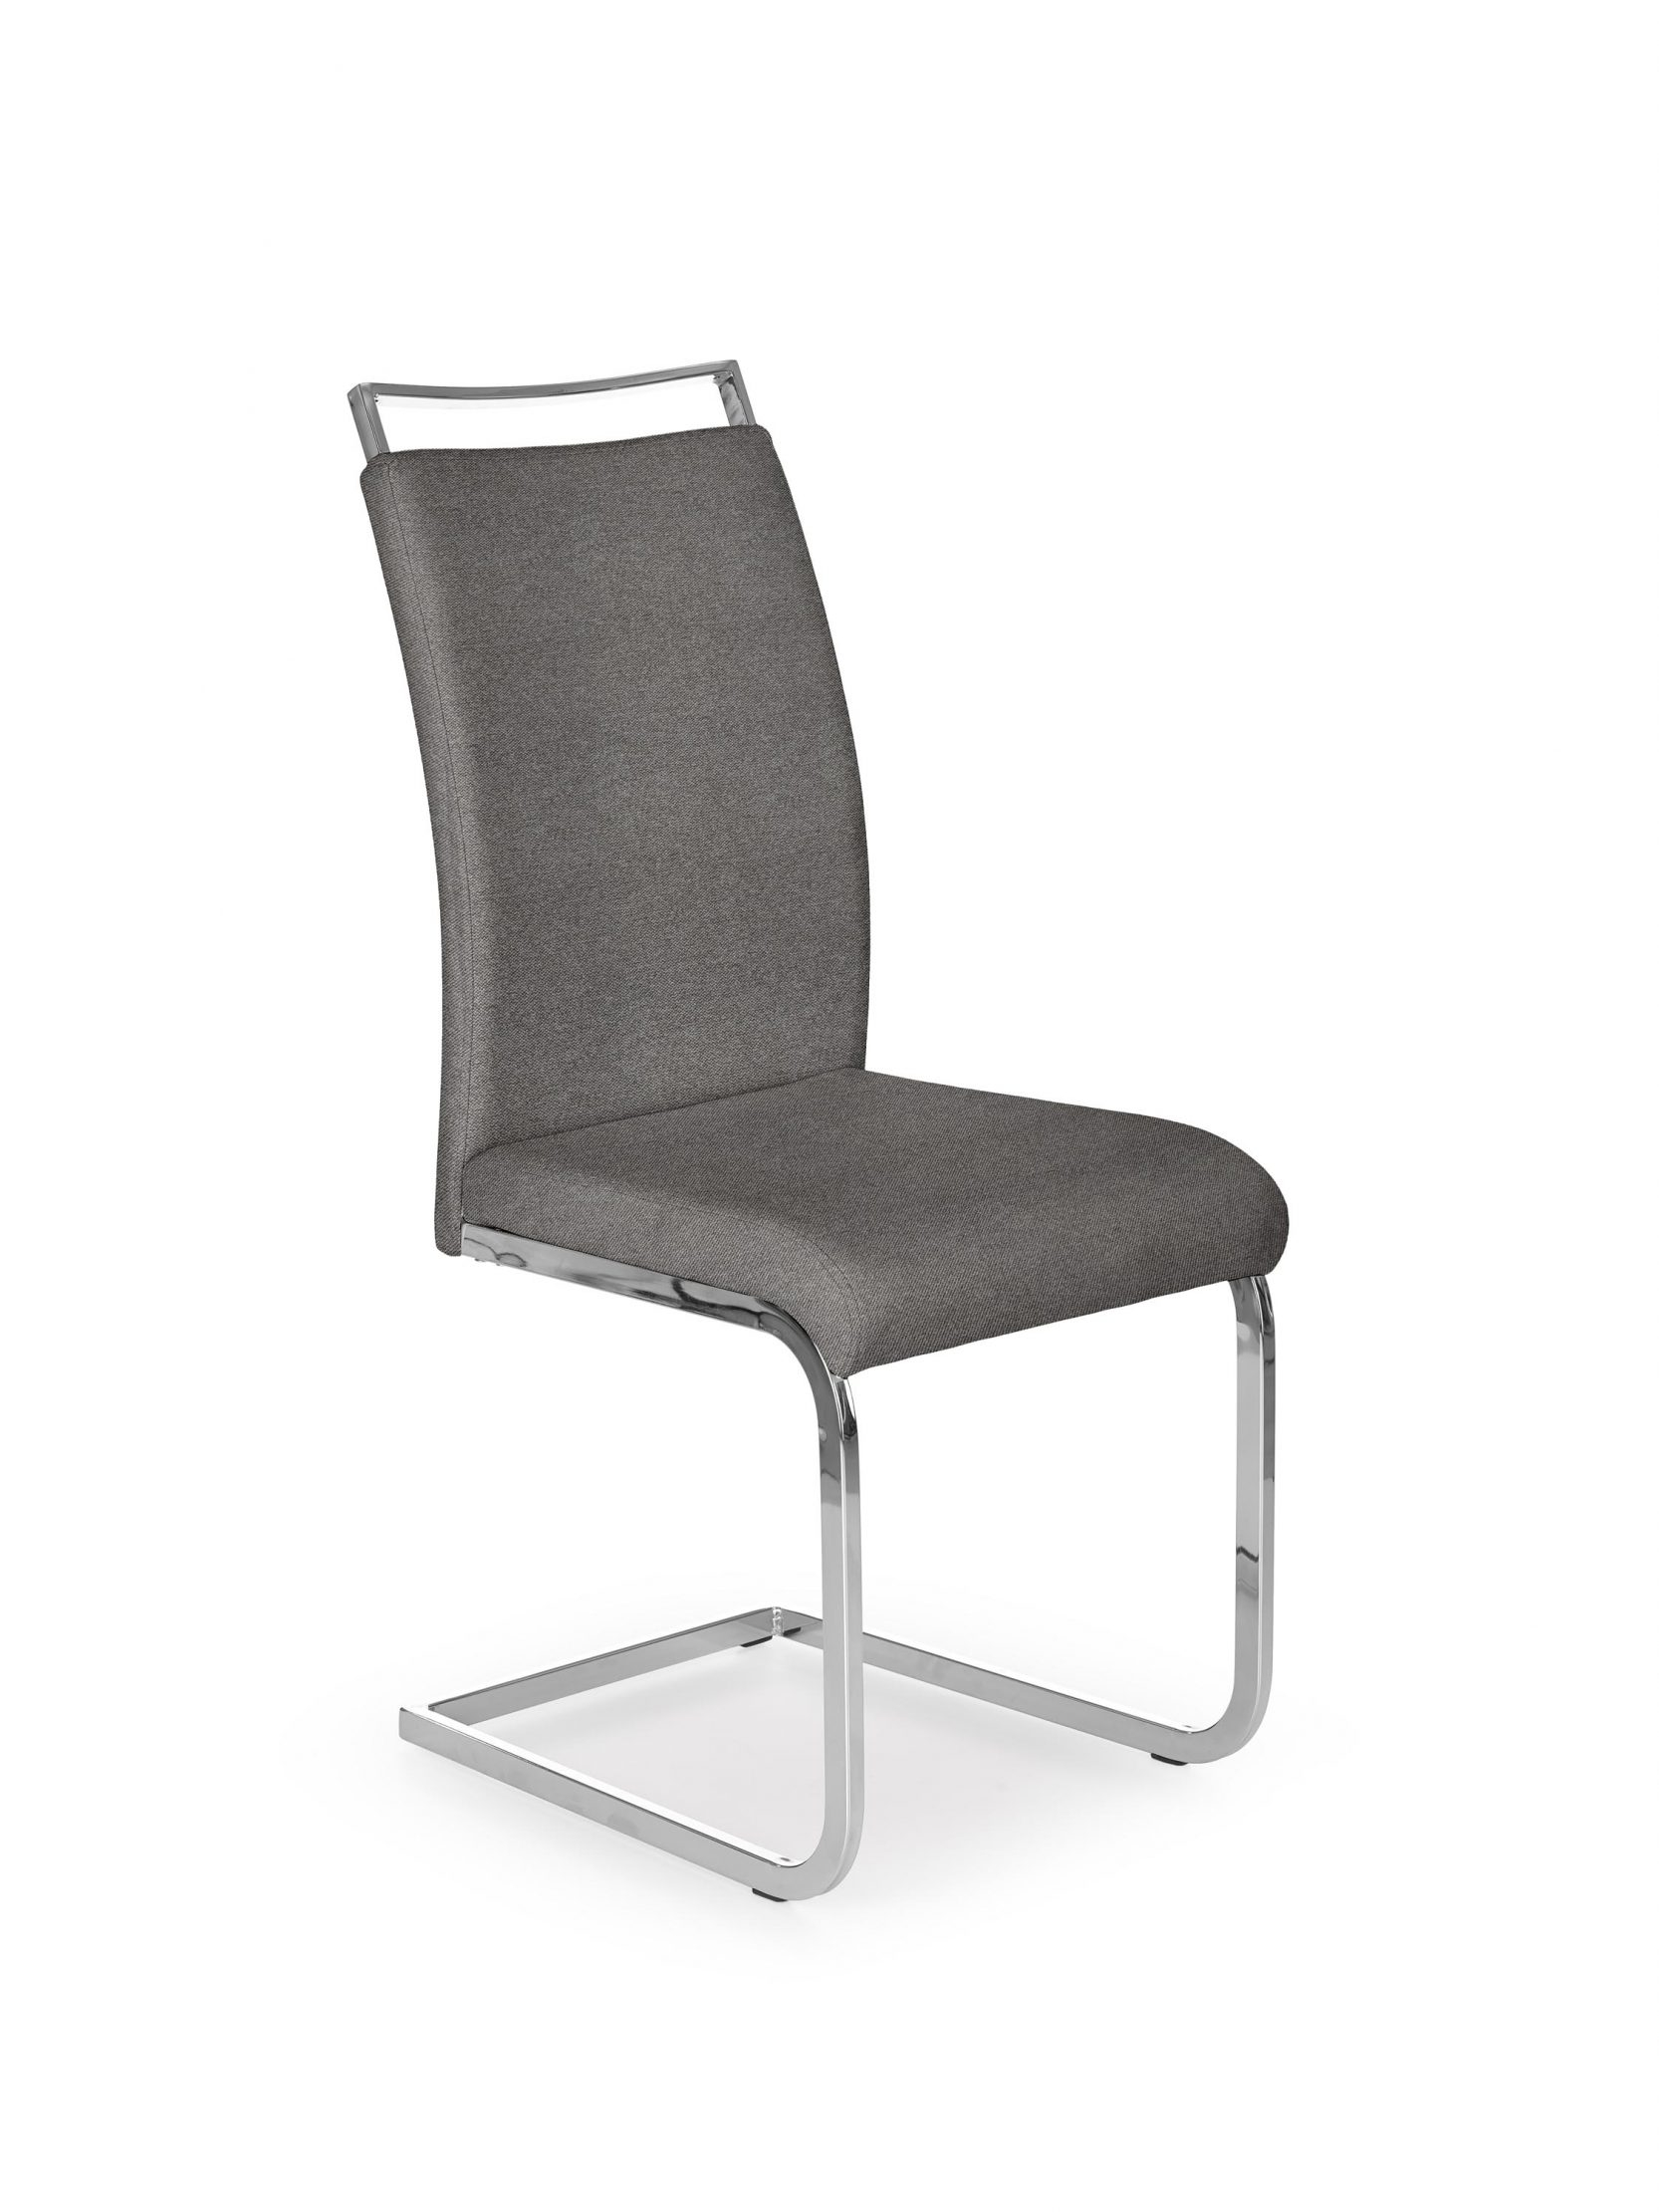 Scaun tapitat cu stofa, cu picioare metalice K348 Gri / Crom, l42xA59xH99 cm imagine